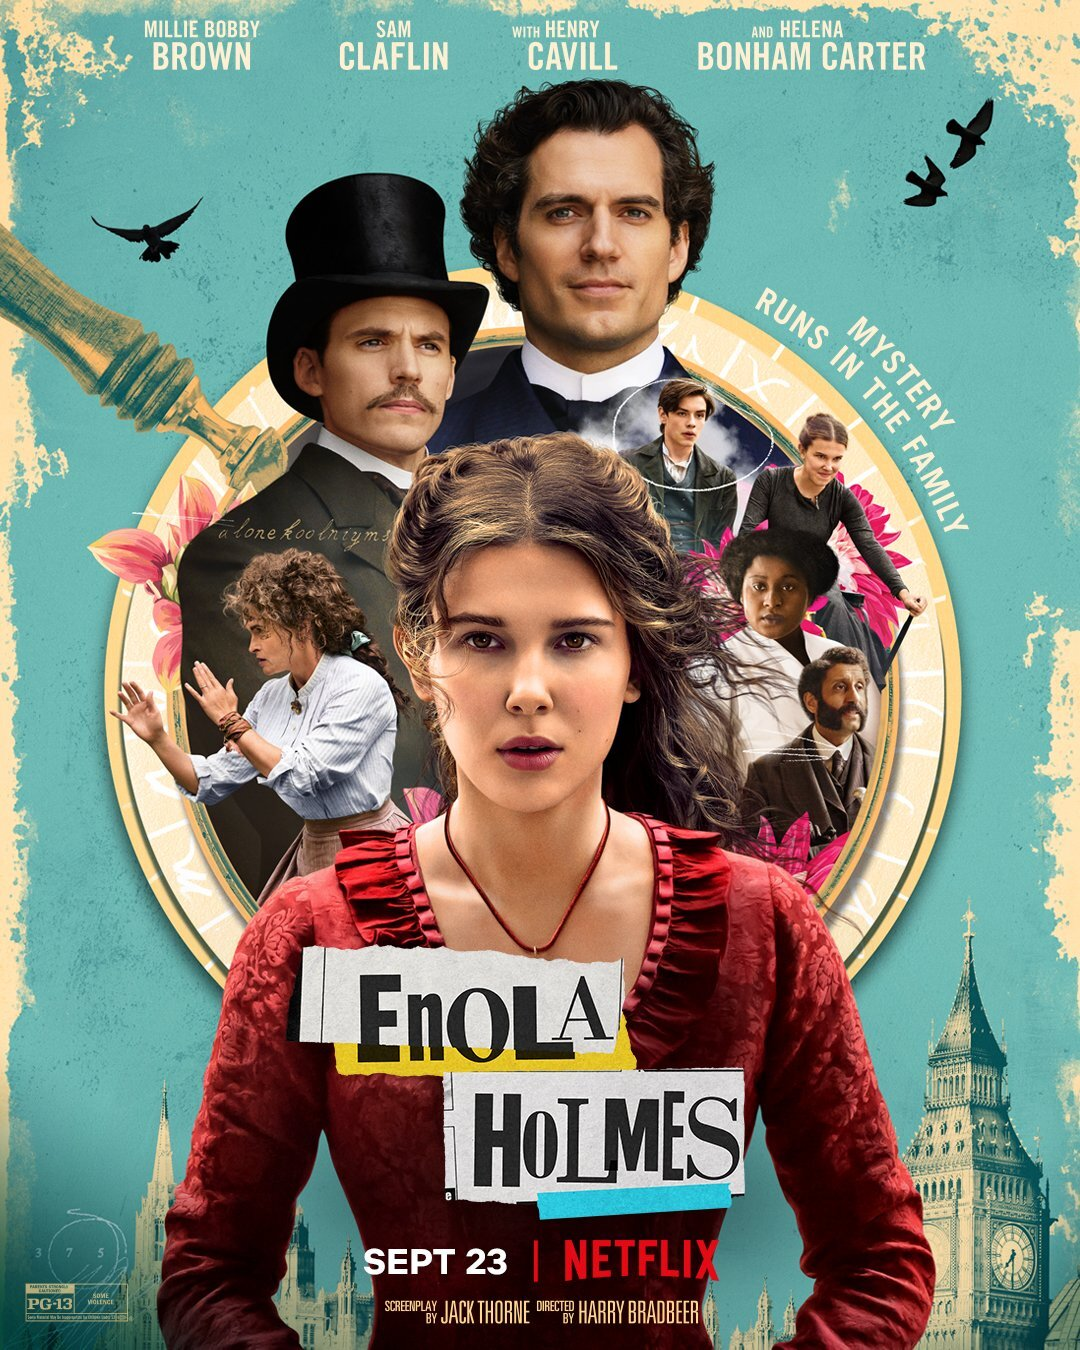 """Enola Holmes"": One-SentenceReview"